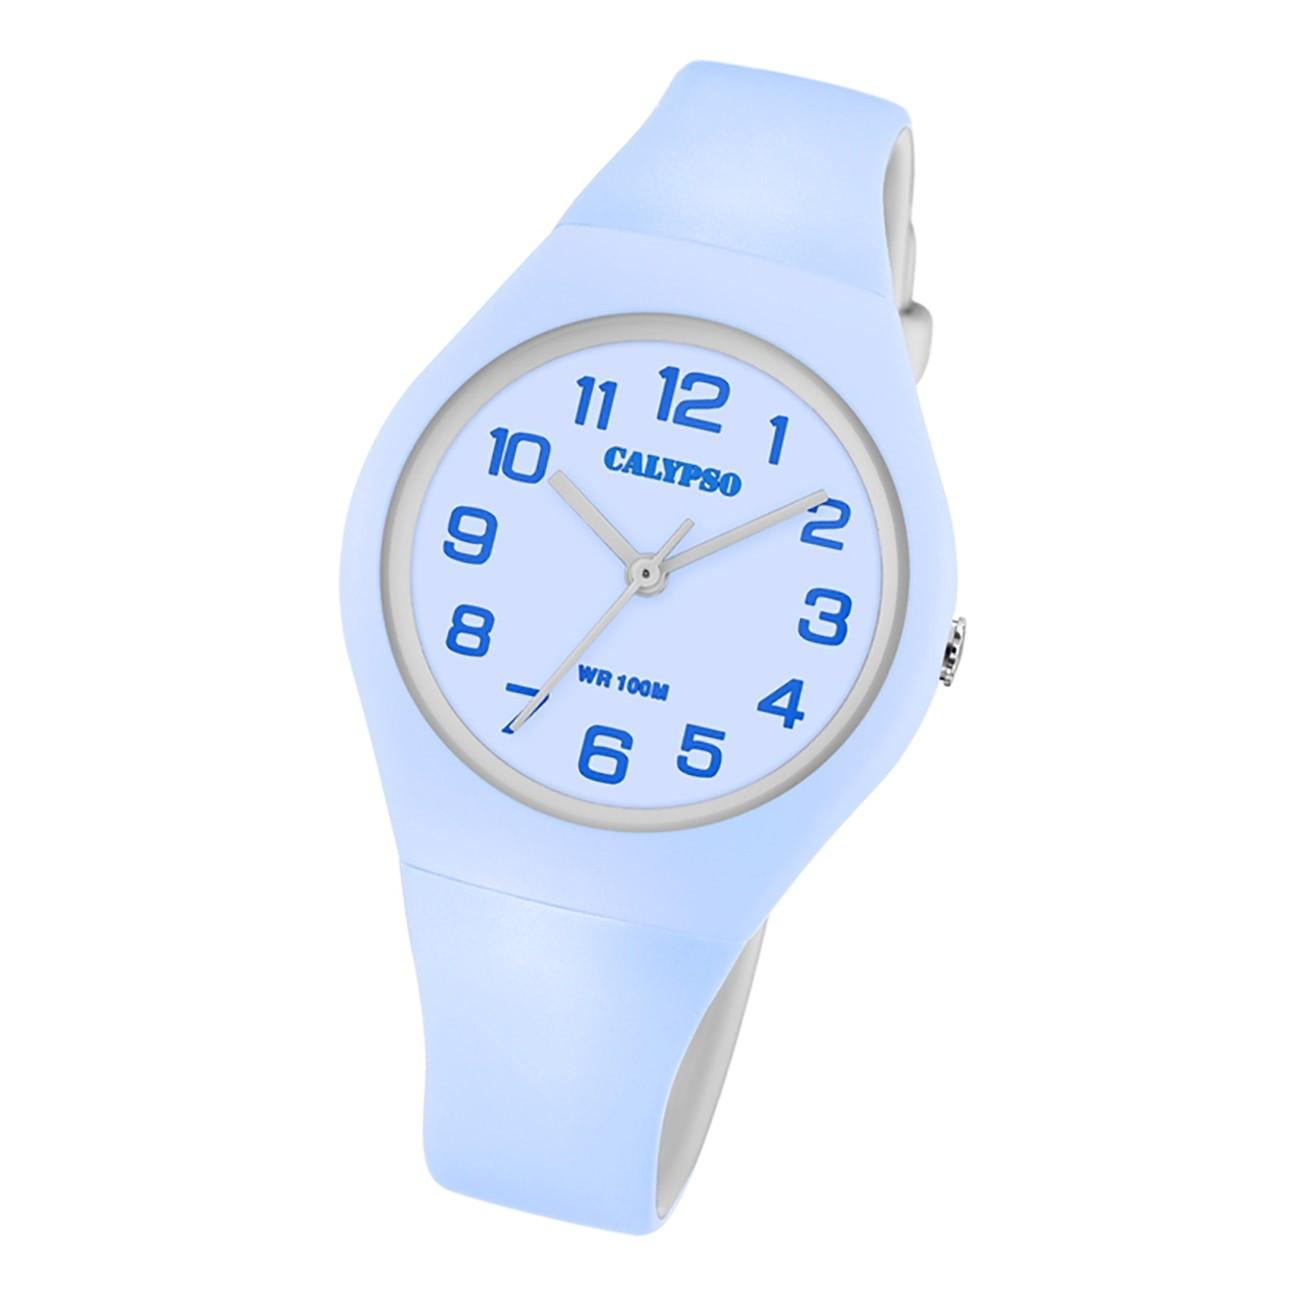 Calypso Damen Jugend Armbanduhr K5777/2 Analog Kunststoff hellblau UK5777/2